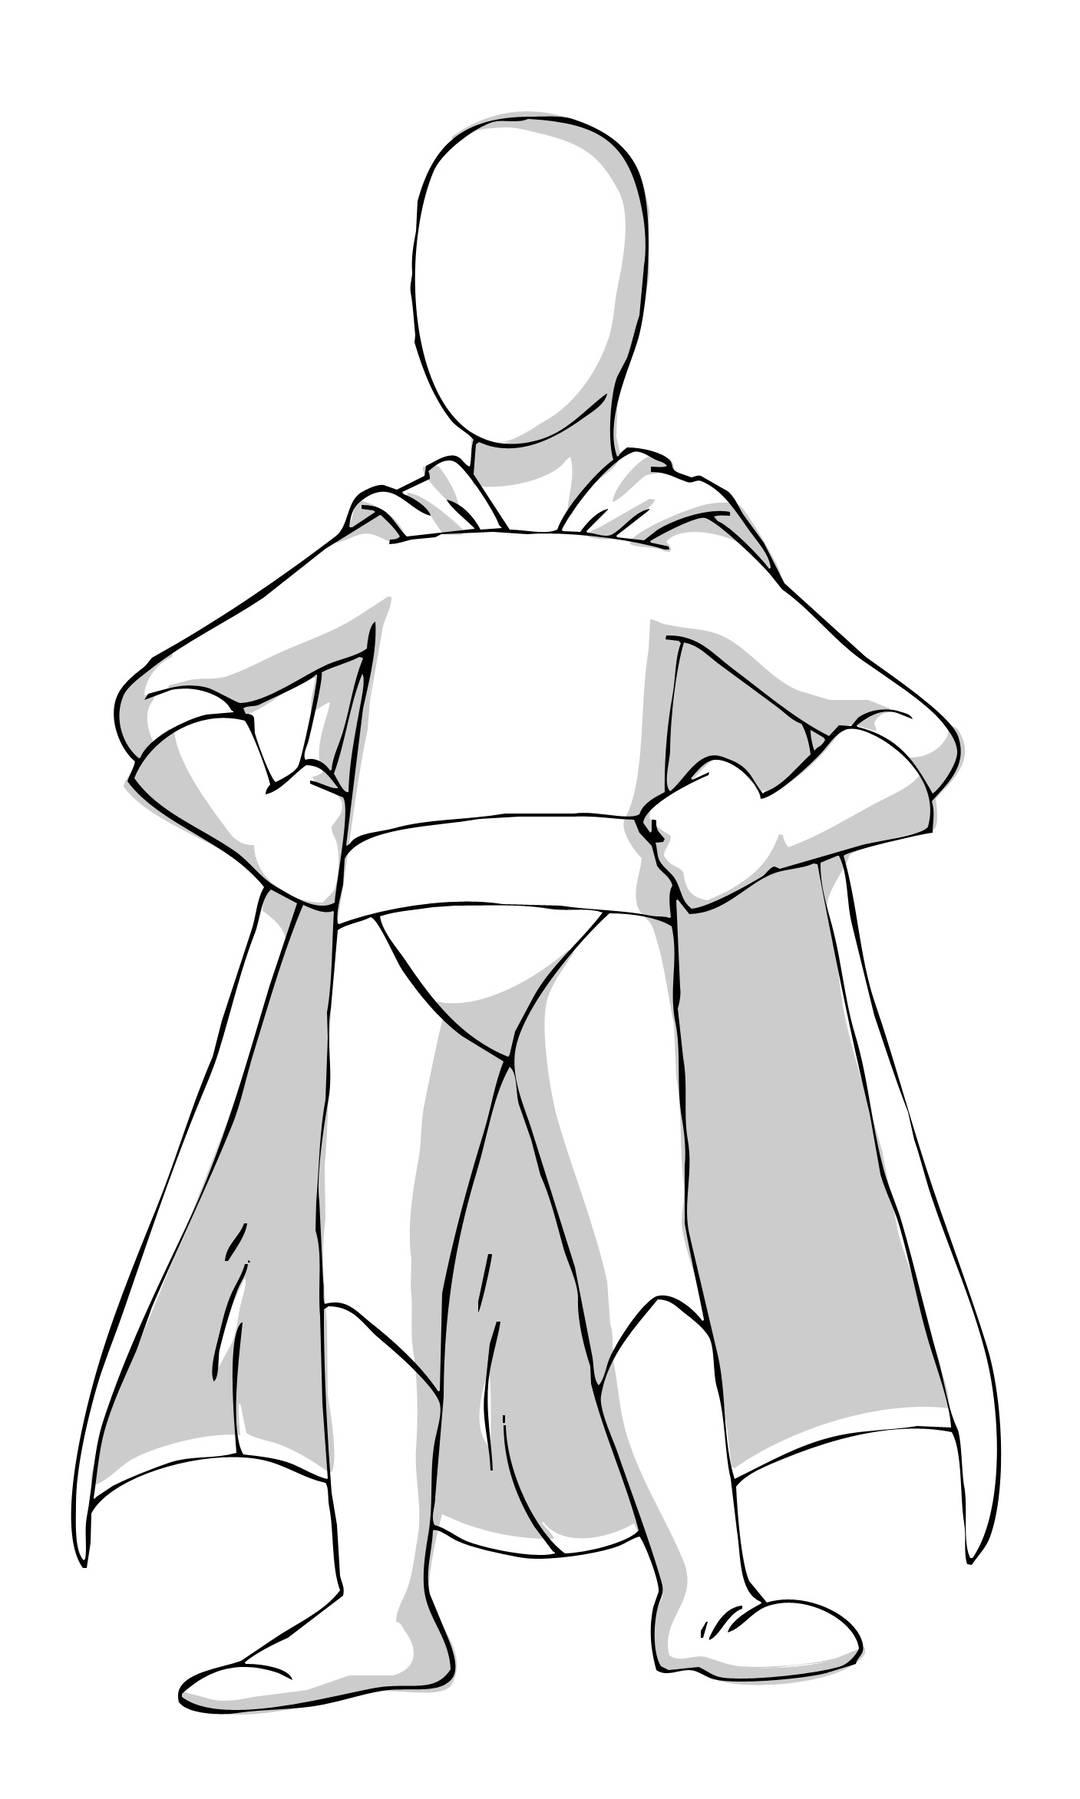 Superflex is Me